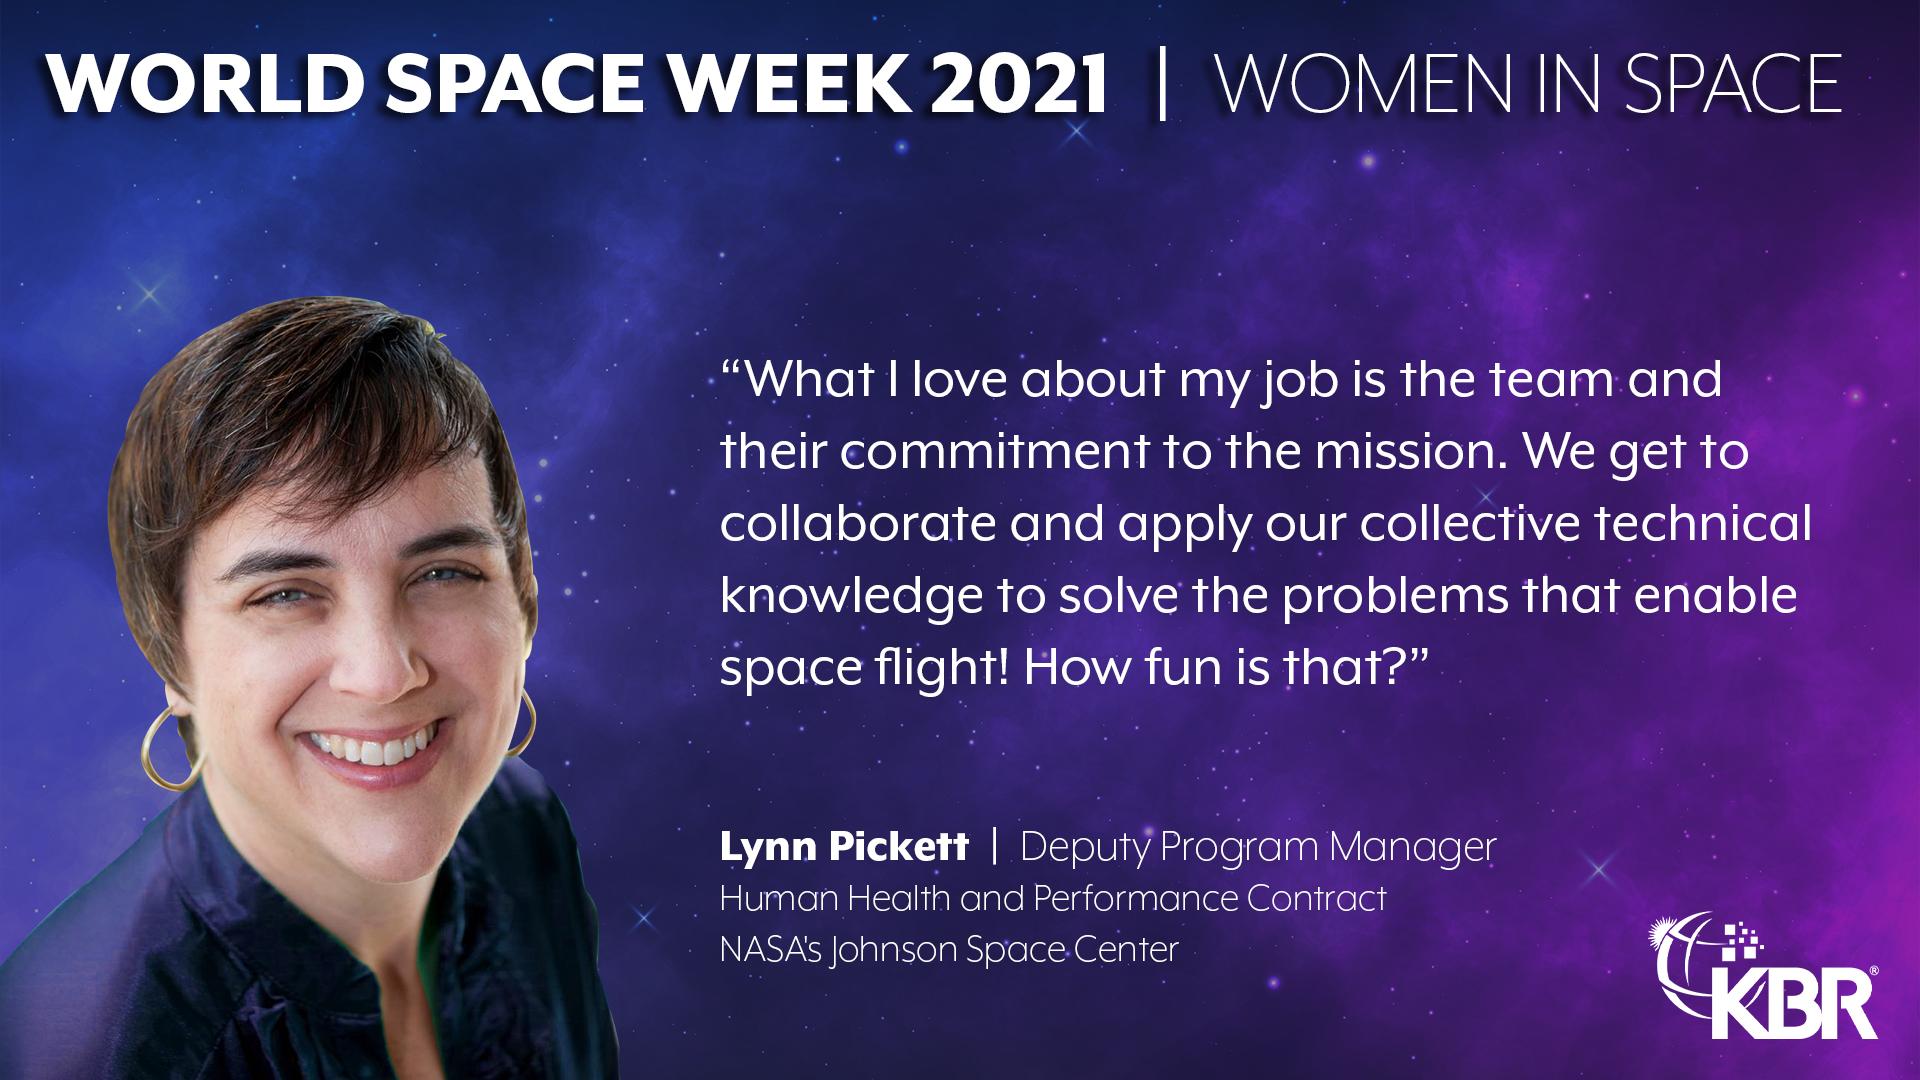 lynn-pickett-world-space-week